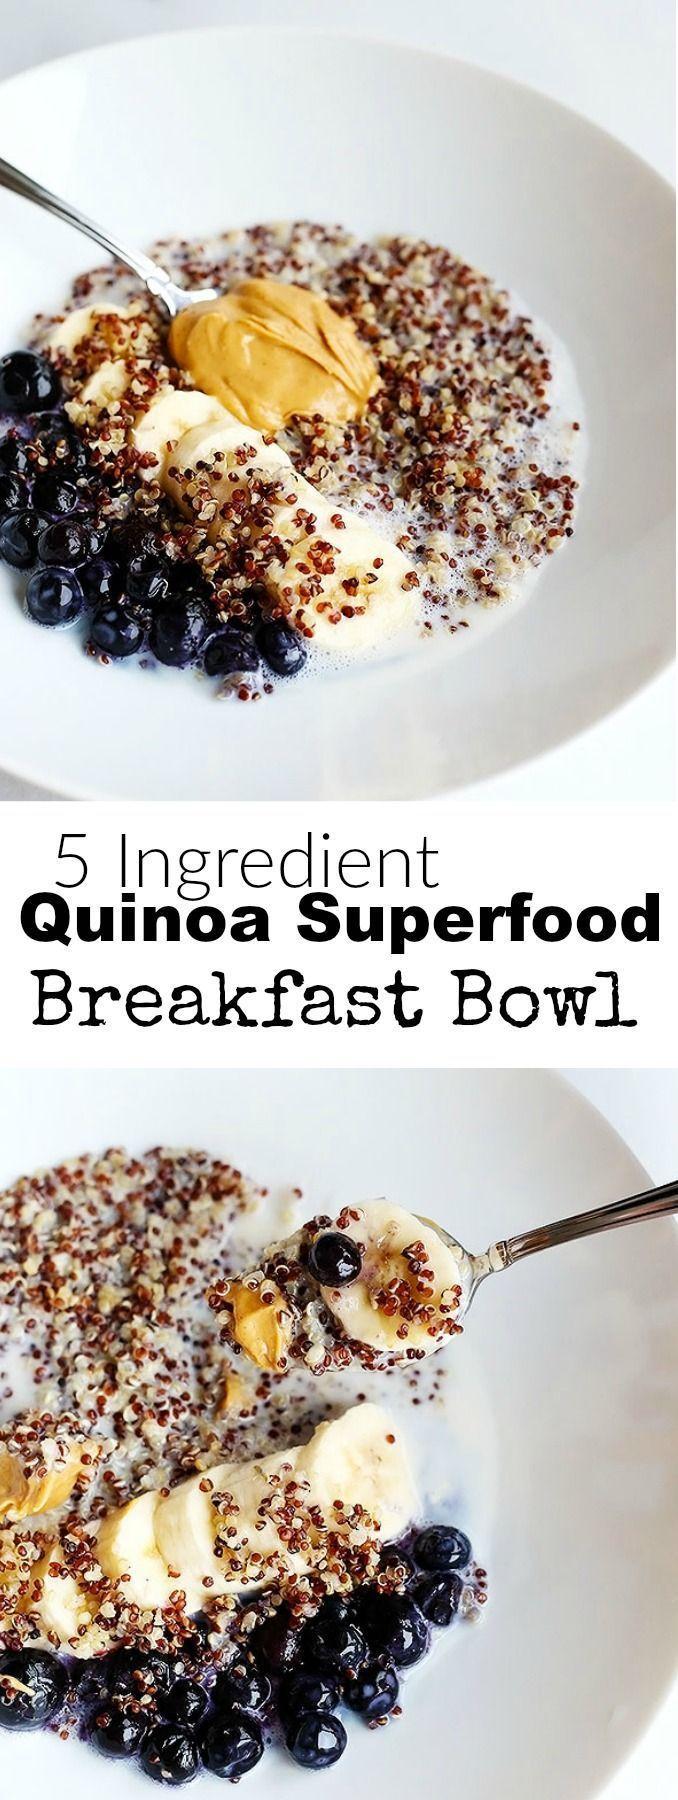 Recipe // Banana + Blueberries + Almond Milk + Peanut Butter + Quinoa